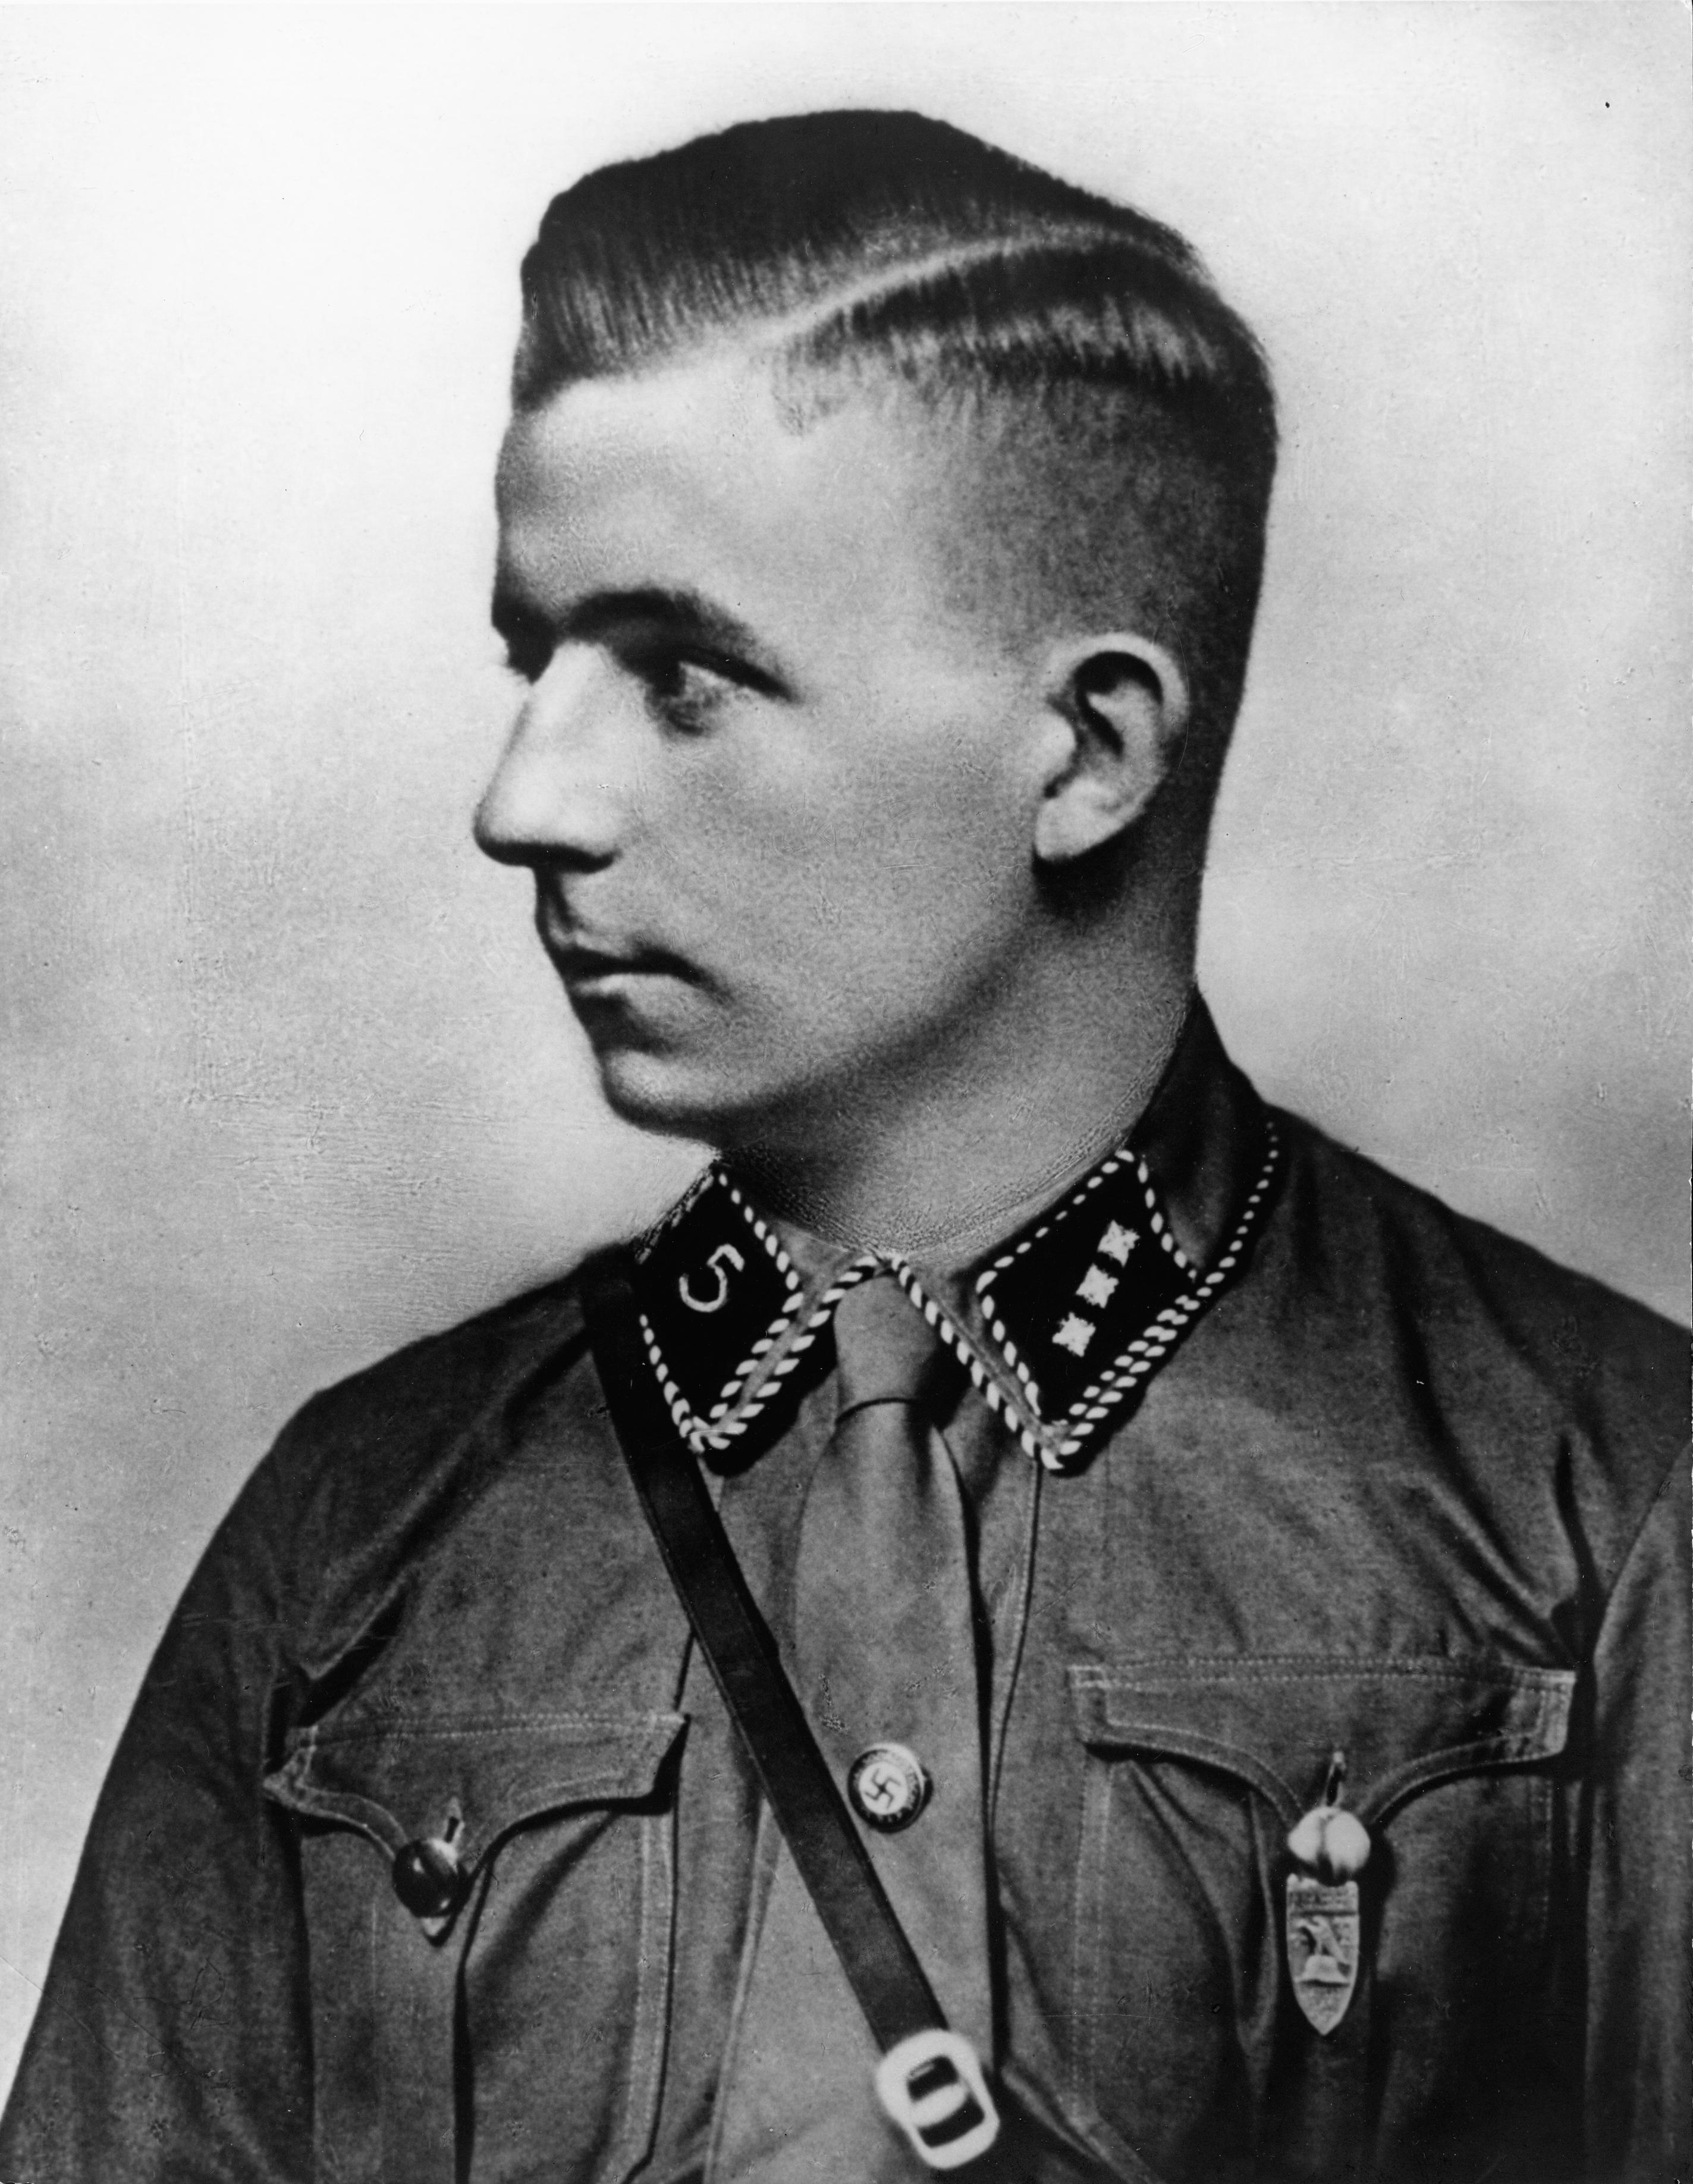 Horst Wessel - Wikipedia